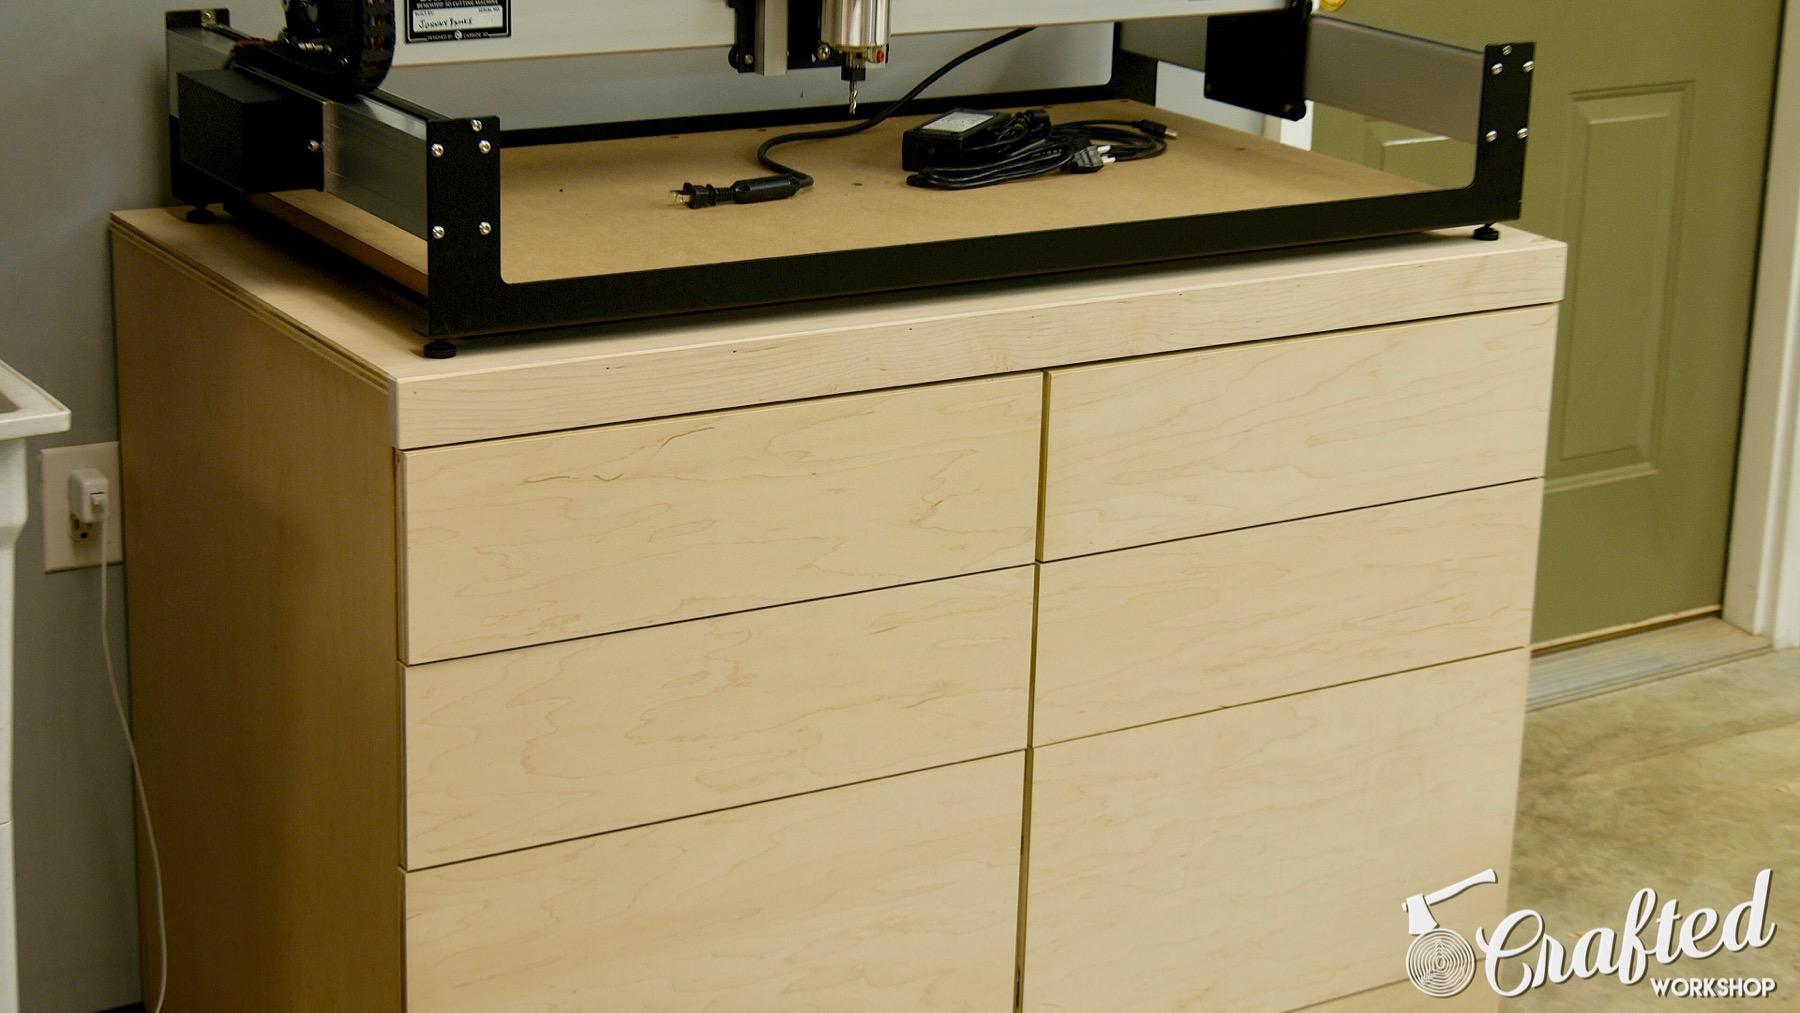 shapeoko 3 xl CNC Table Tool Storage Cabinet